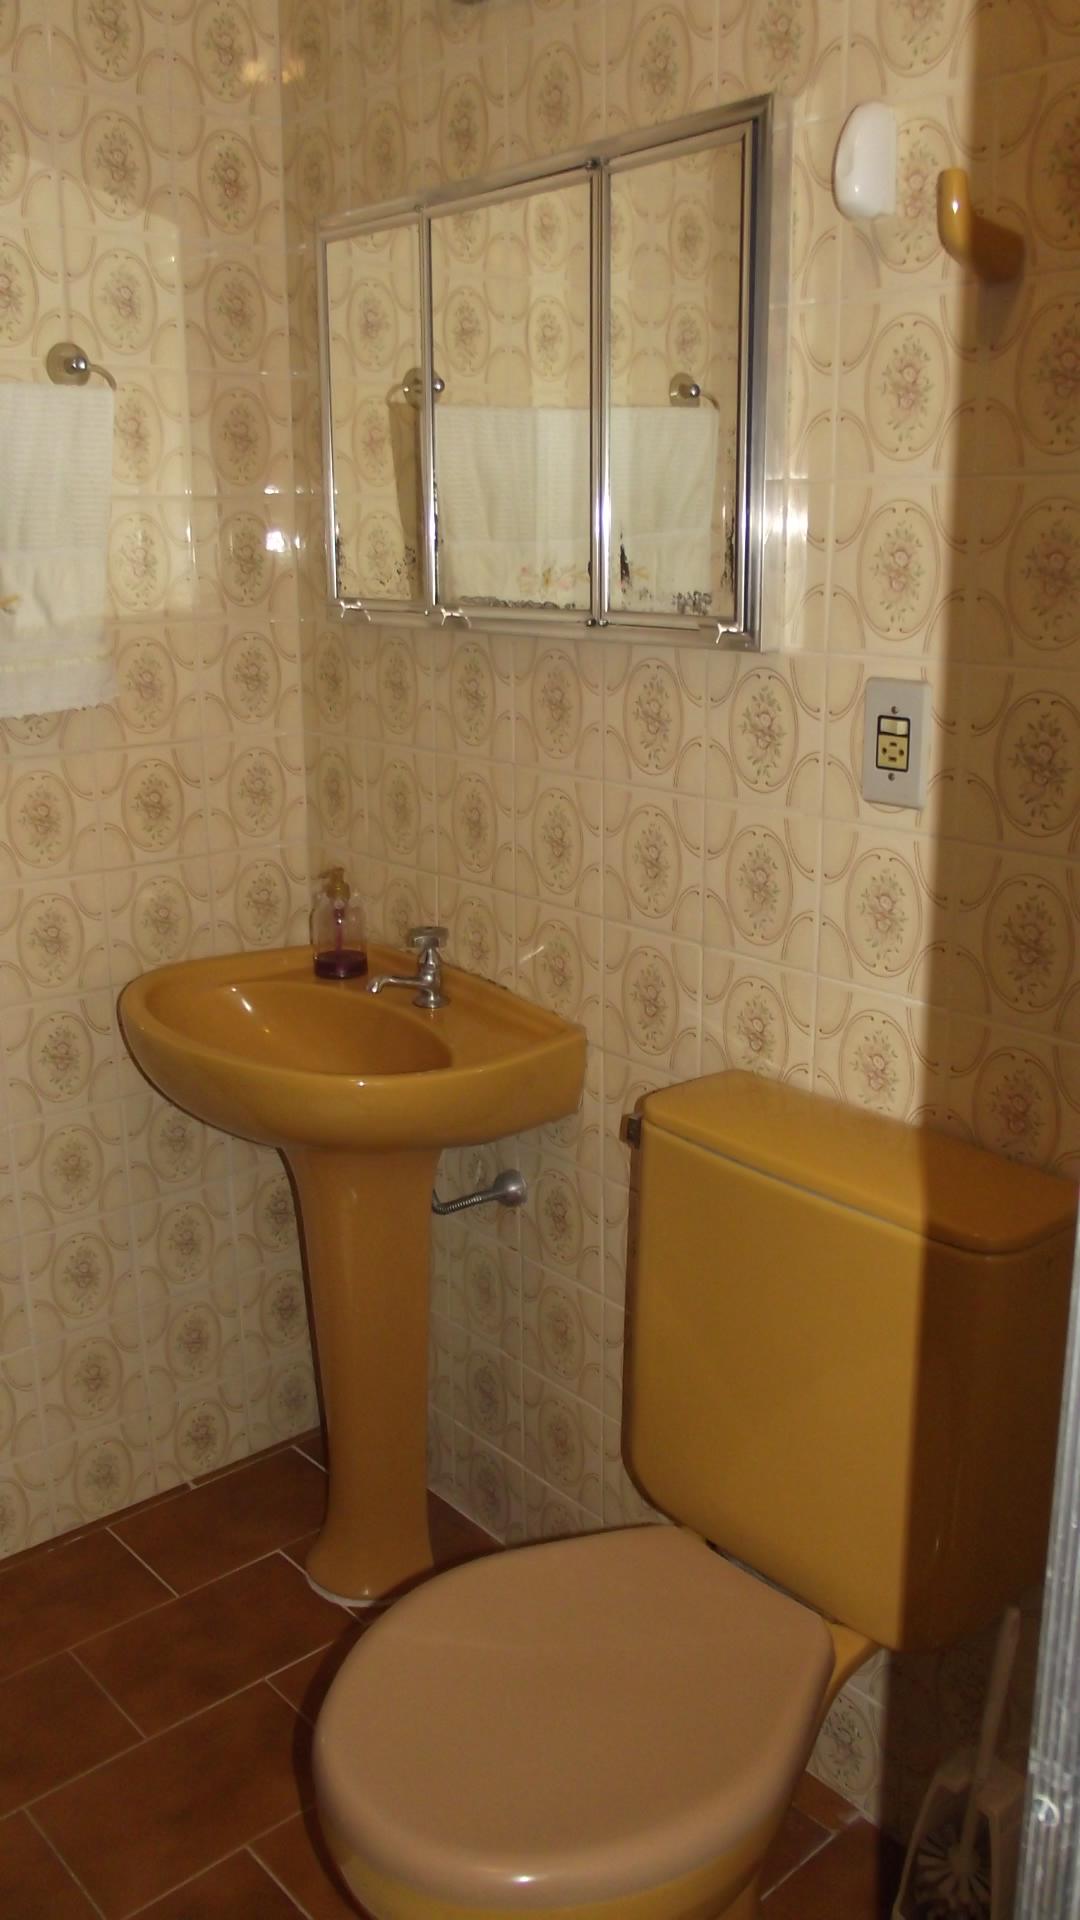 box do mesmo banheiro pastilhas na faixa do chuveiro e no nicho #44230D 1080 1920